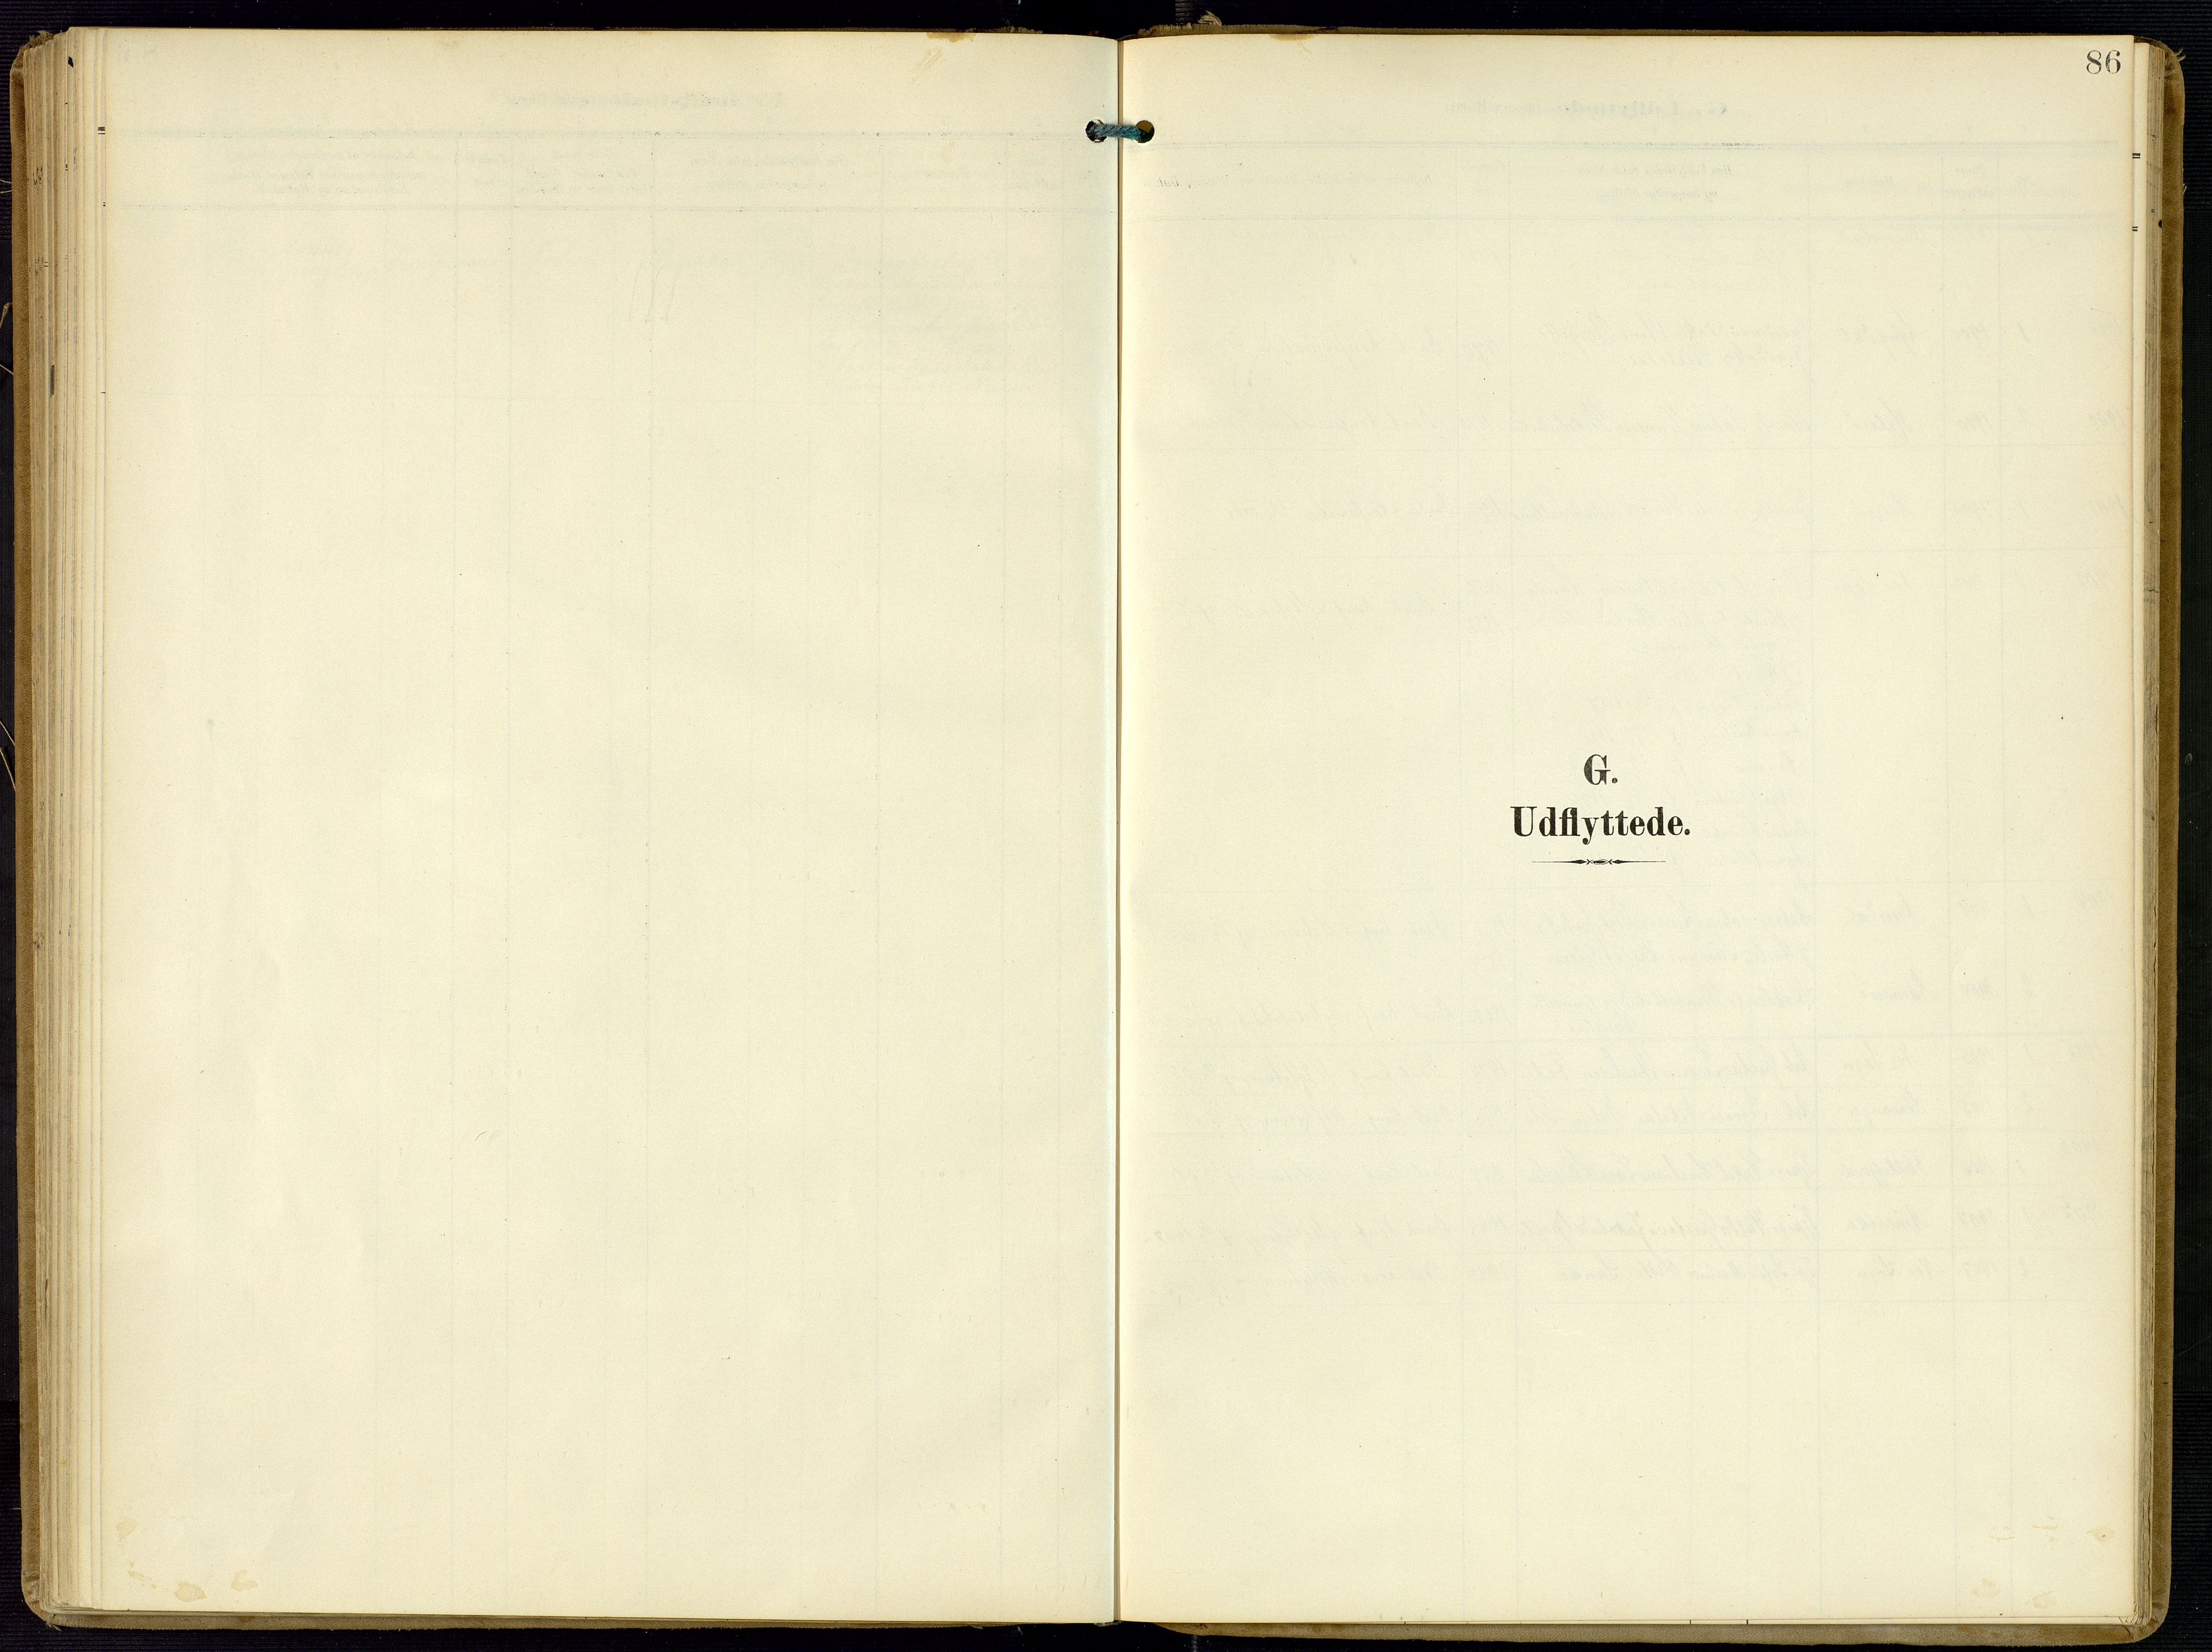 SAK, Kvinesdal sokneprestkontor, F/Fa/Faa/L0005: Ministerialbok nr. A 5, 1898-1915, s. 86